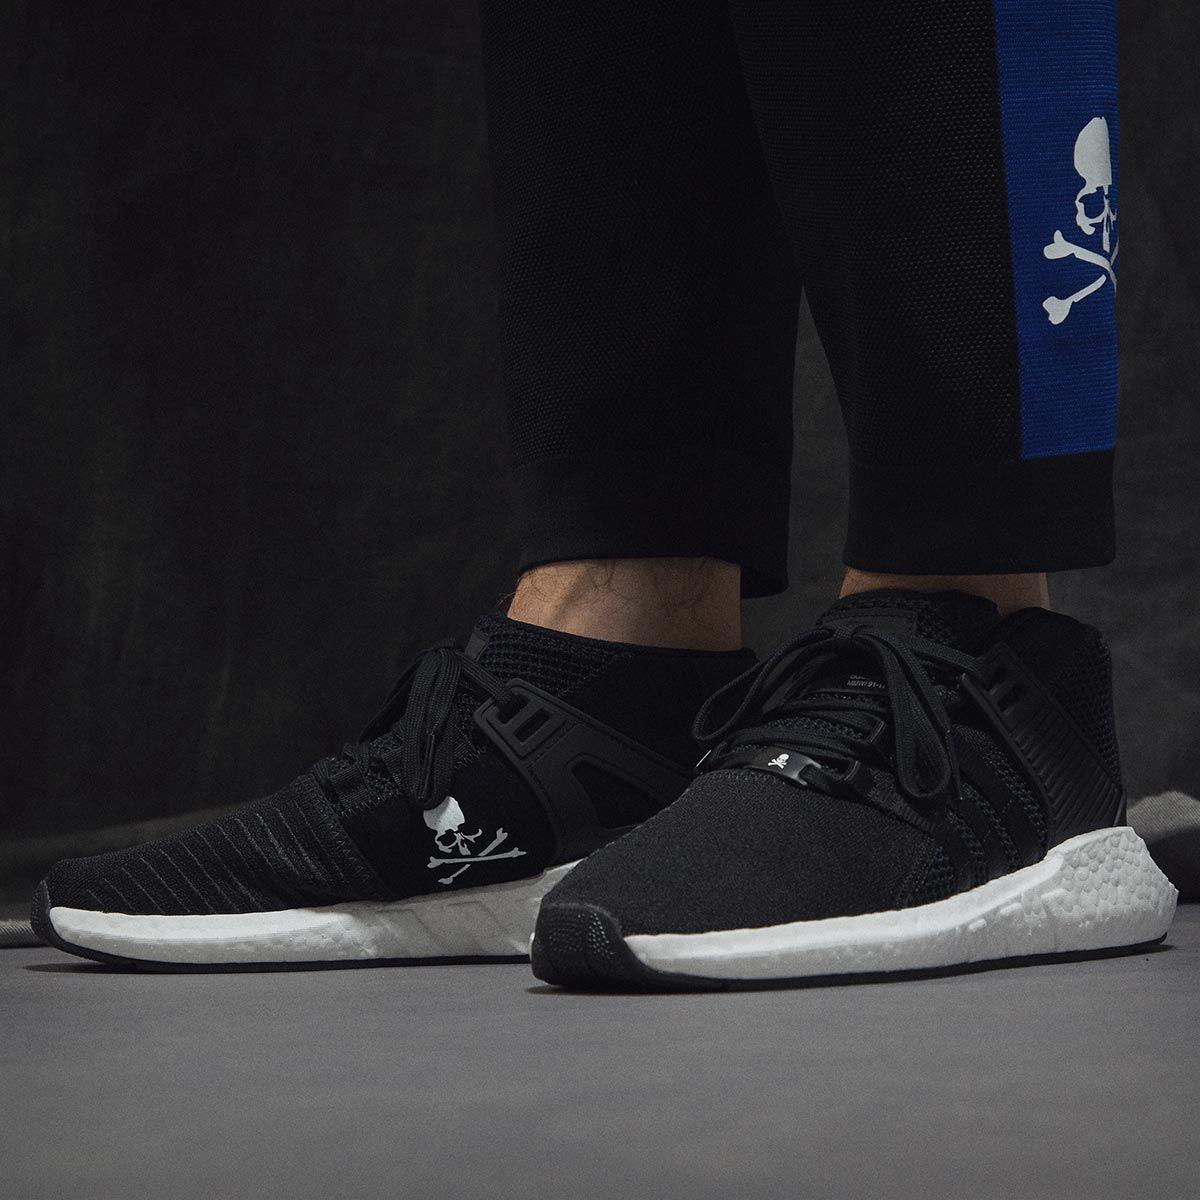 Adidas x Mastermind World EQT Support Mid negro / blanco